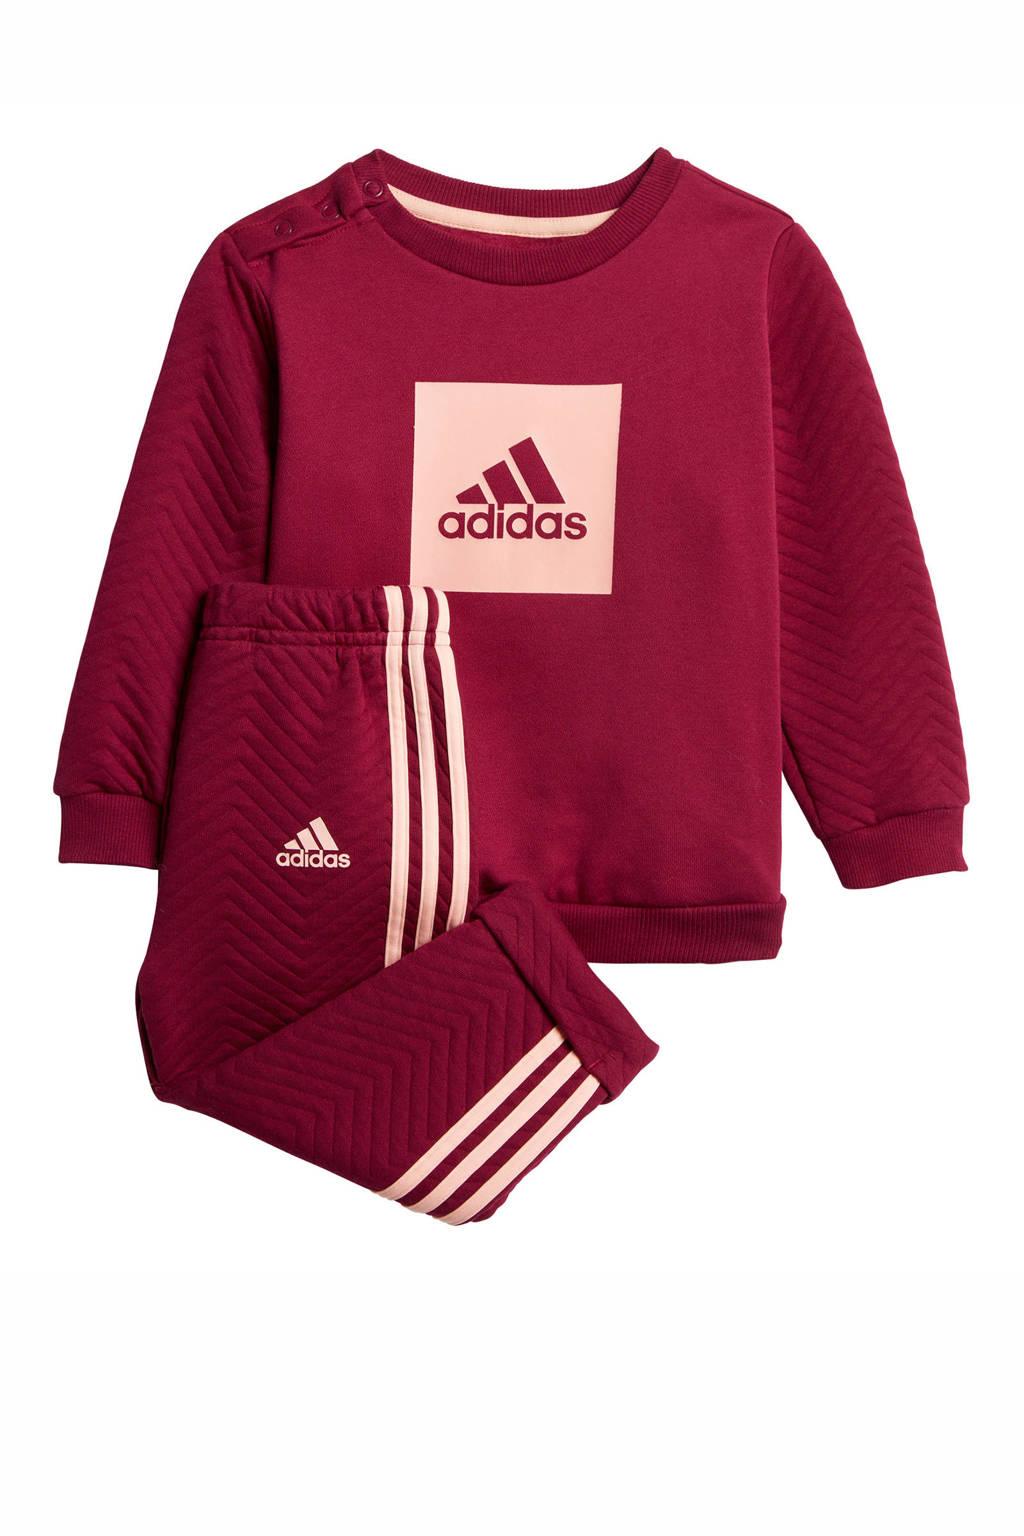 adidas Performance   trainingspak roze/lichtroze, Roze/lichtroze